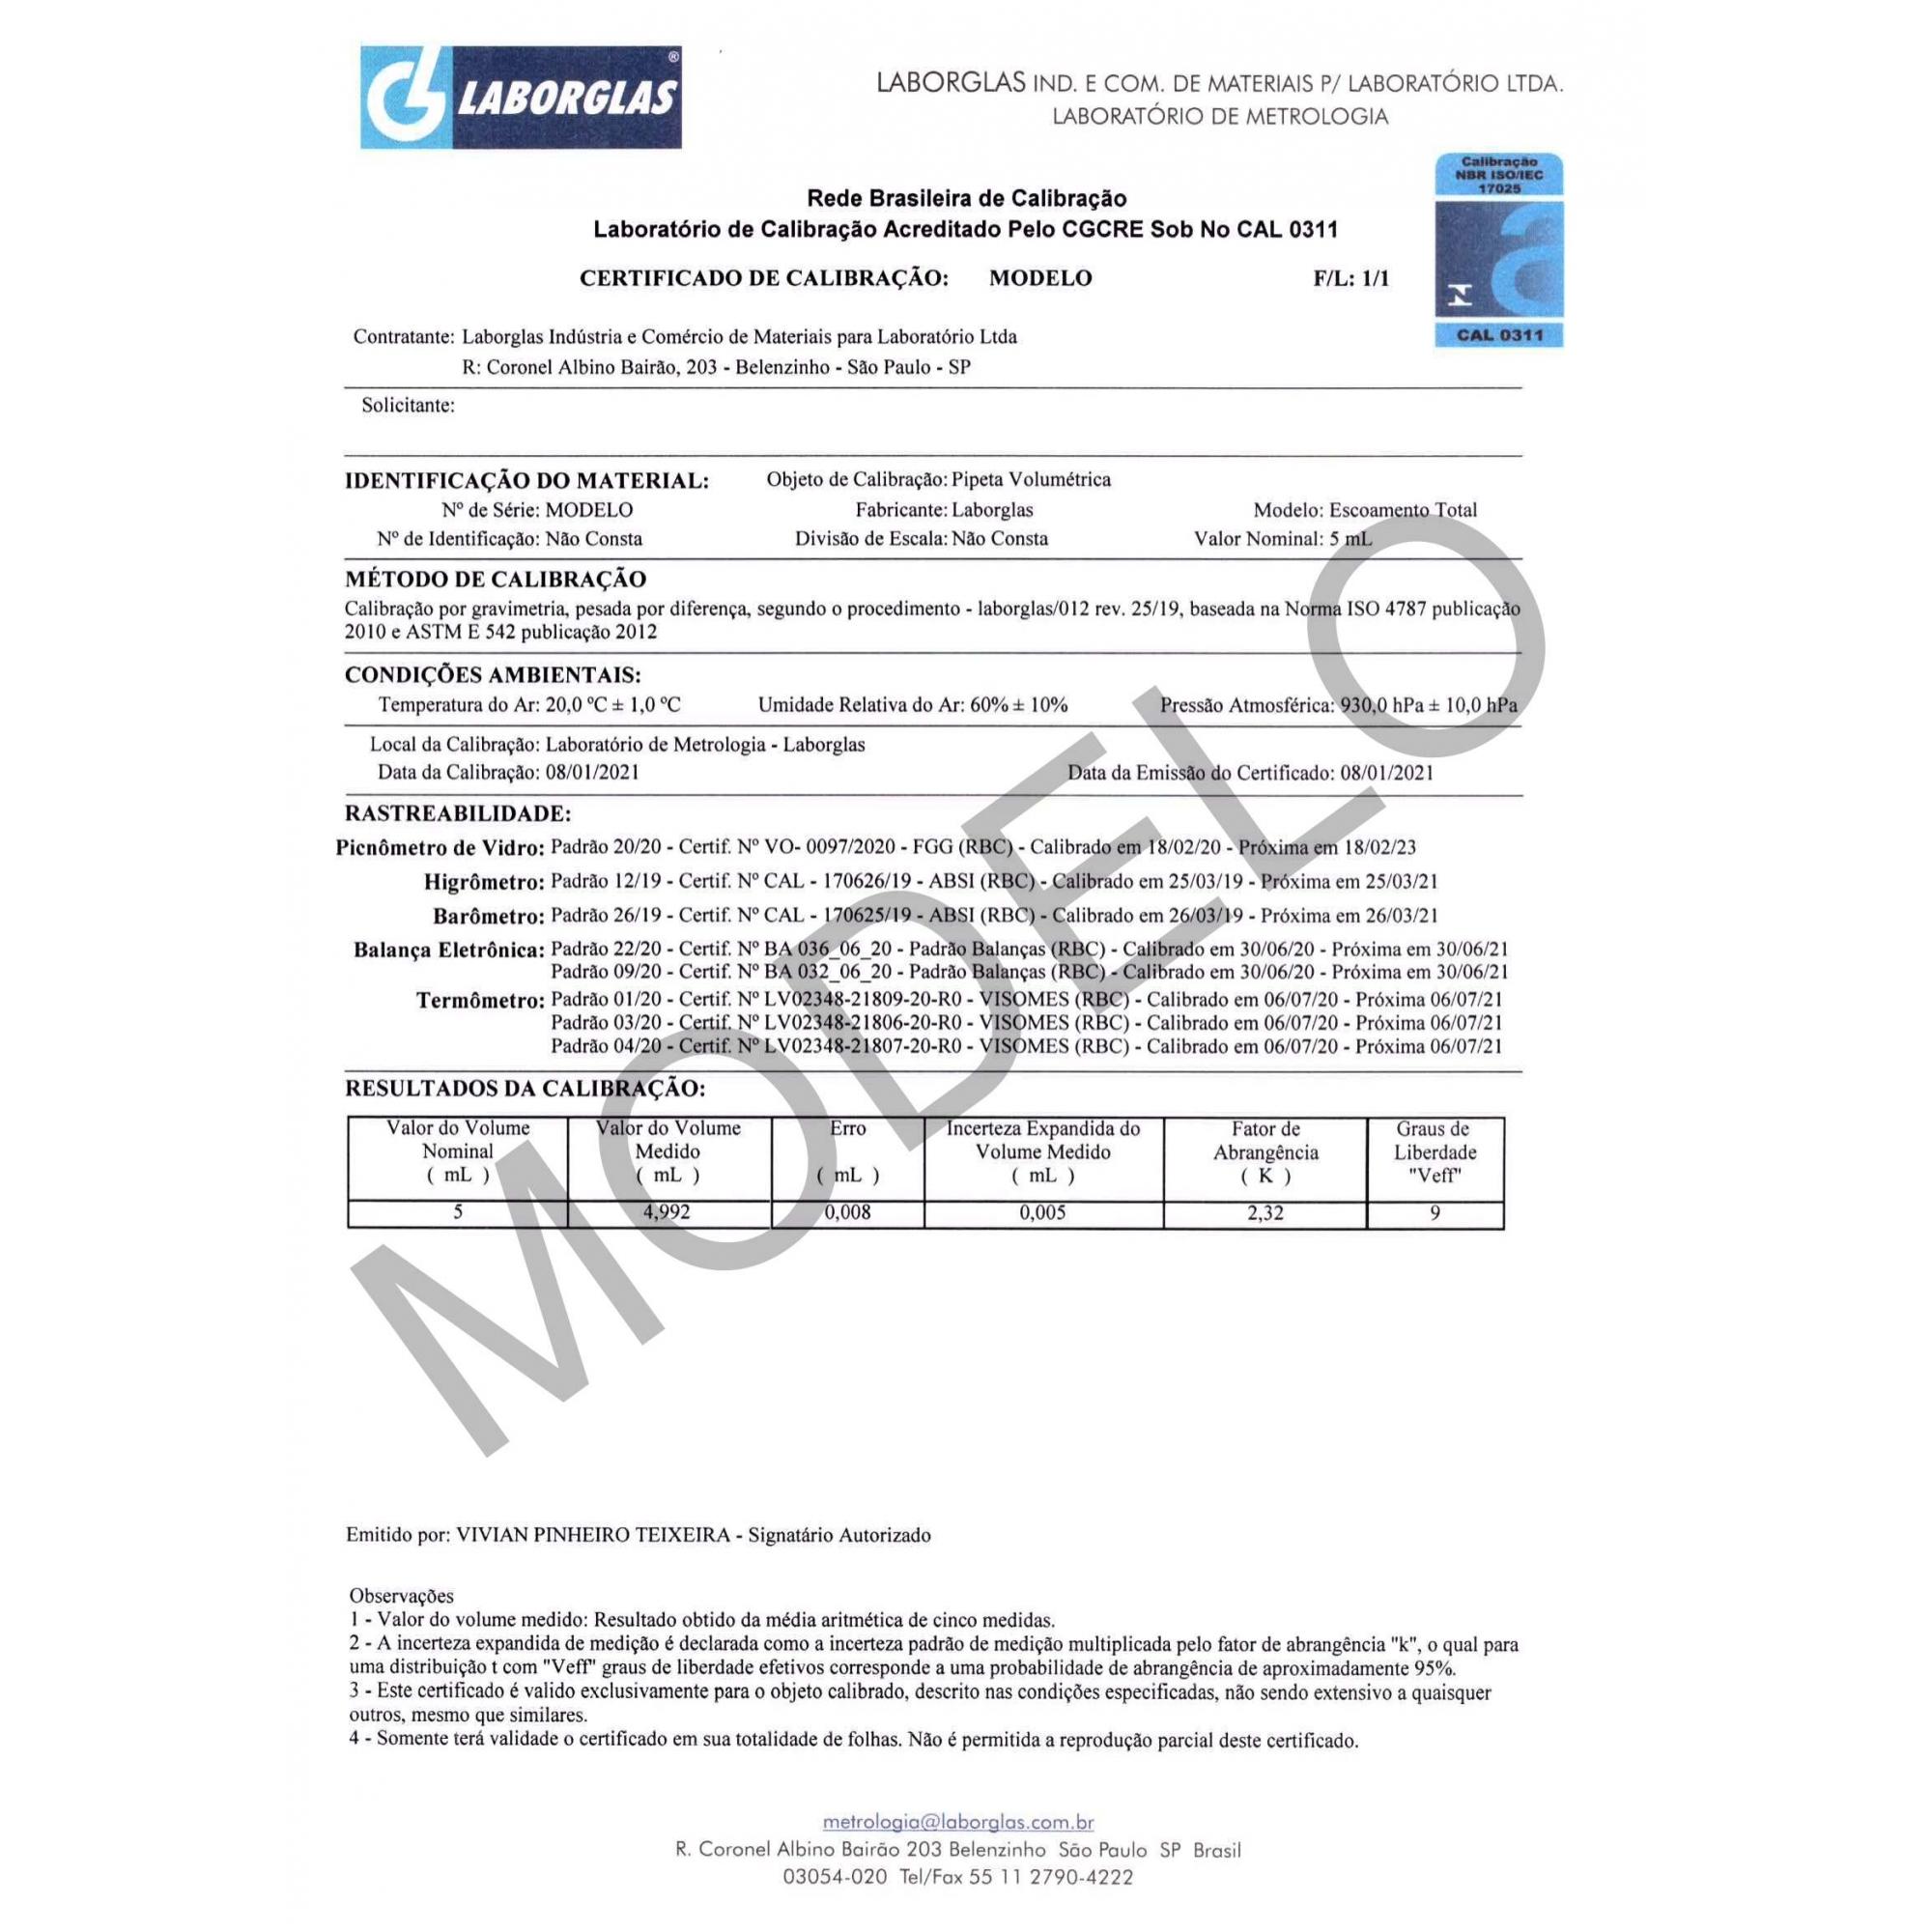 PIPETA VOLUMÉTRICA ESGOTAMENTO TOTAL 10,17 ML CERTIFICADO RBC - Laborglas - Cód. 9433725-R